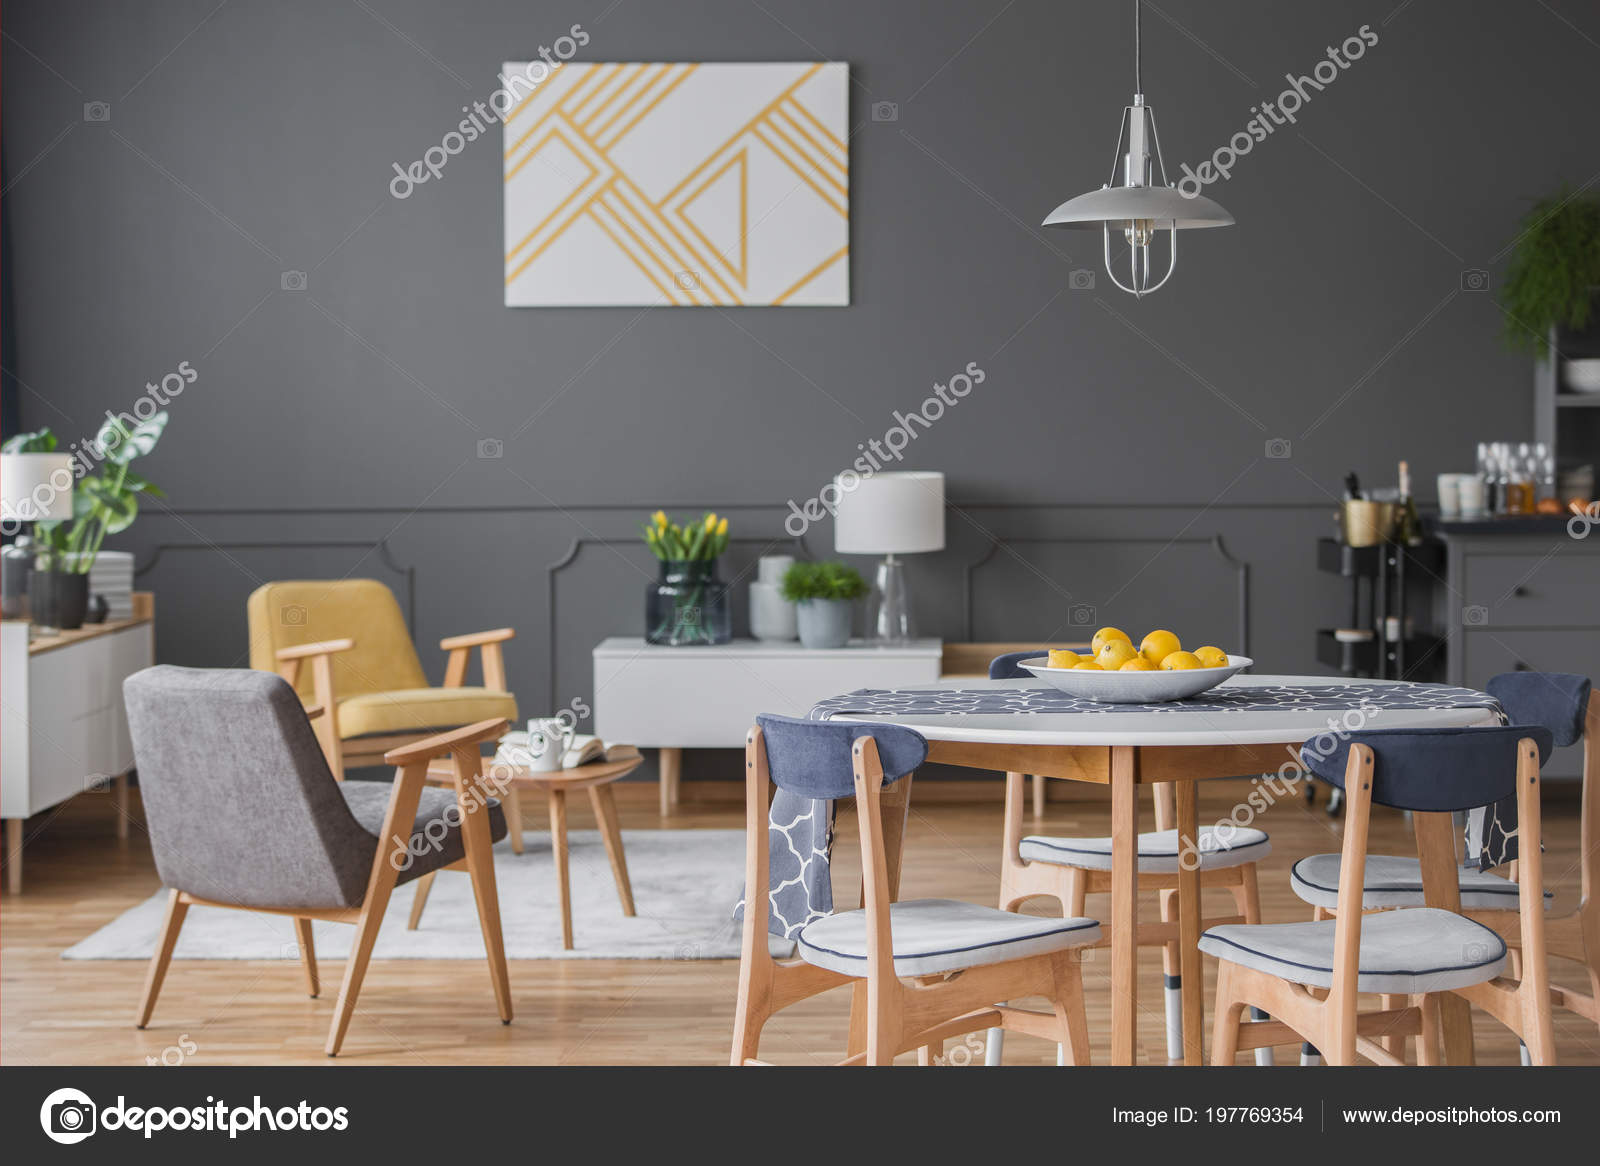 ≥ grijs buffelleer eettafel cuba stoelen outlet retro vintage